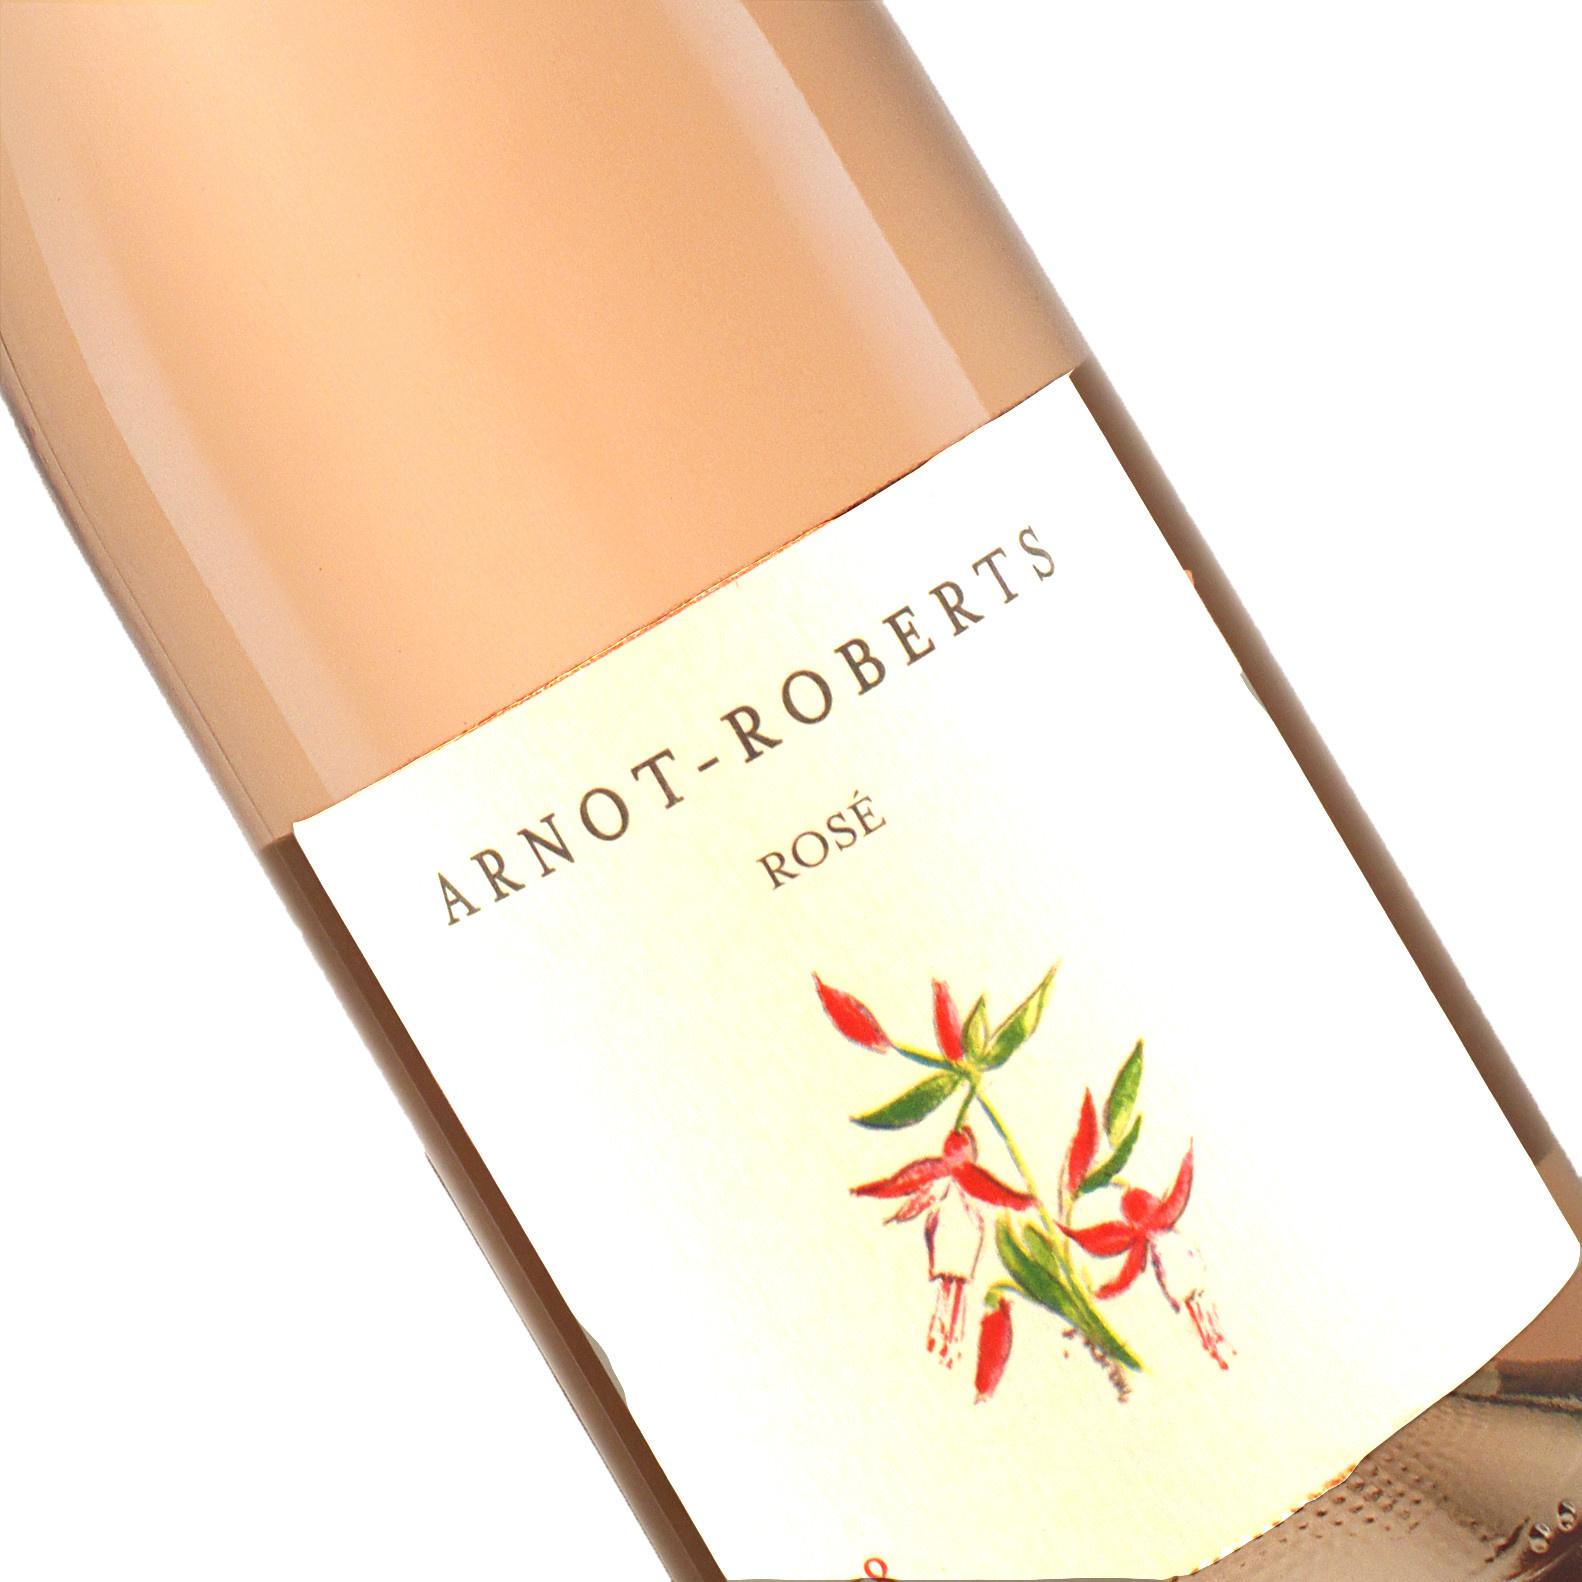 Arnot-Roberts 2018 Rose, California